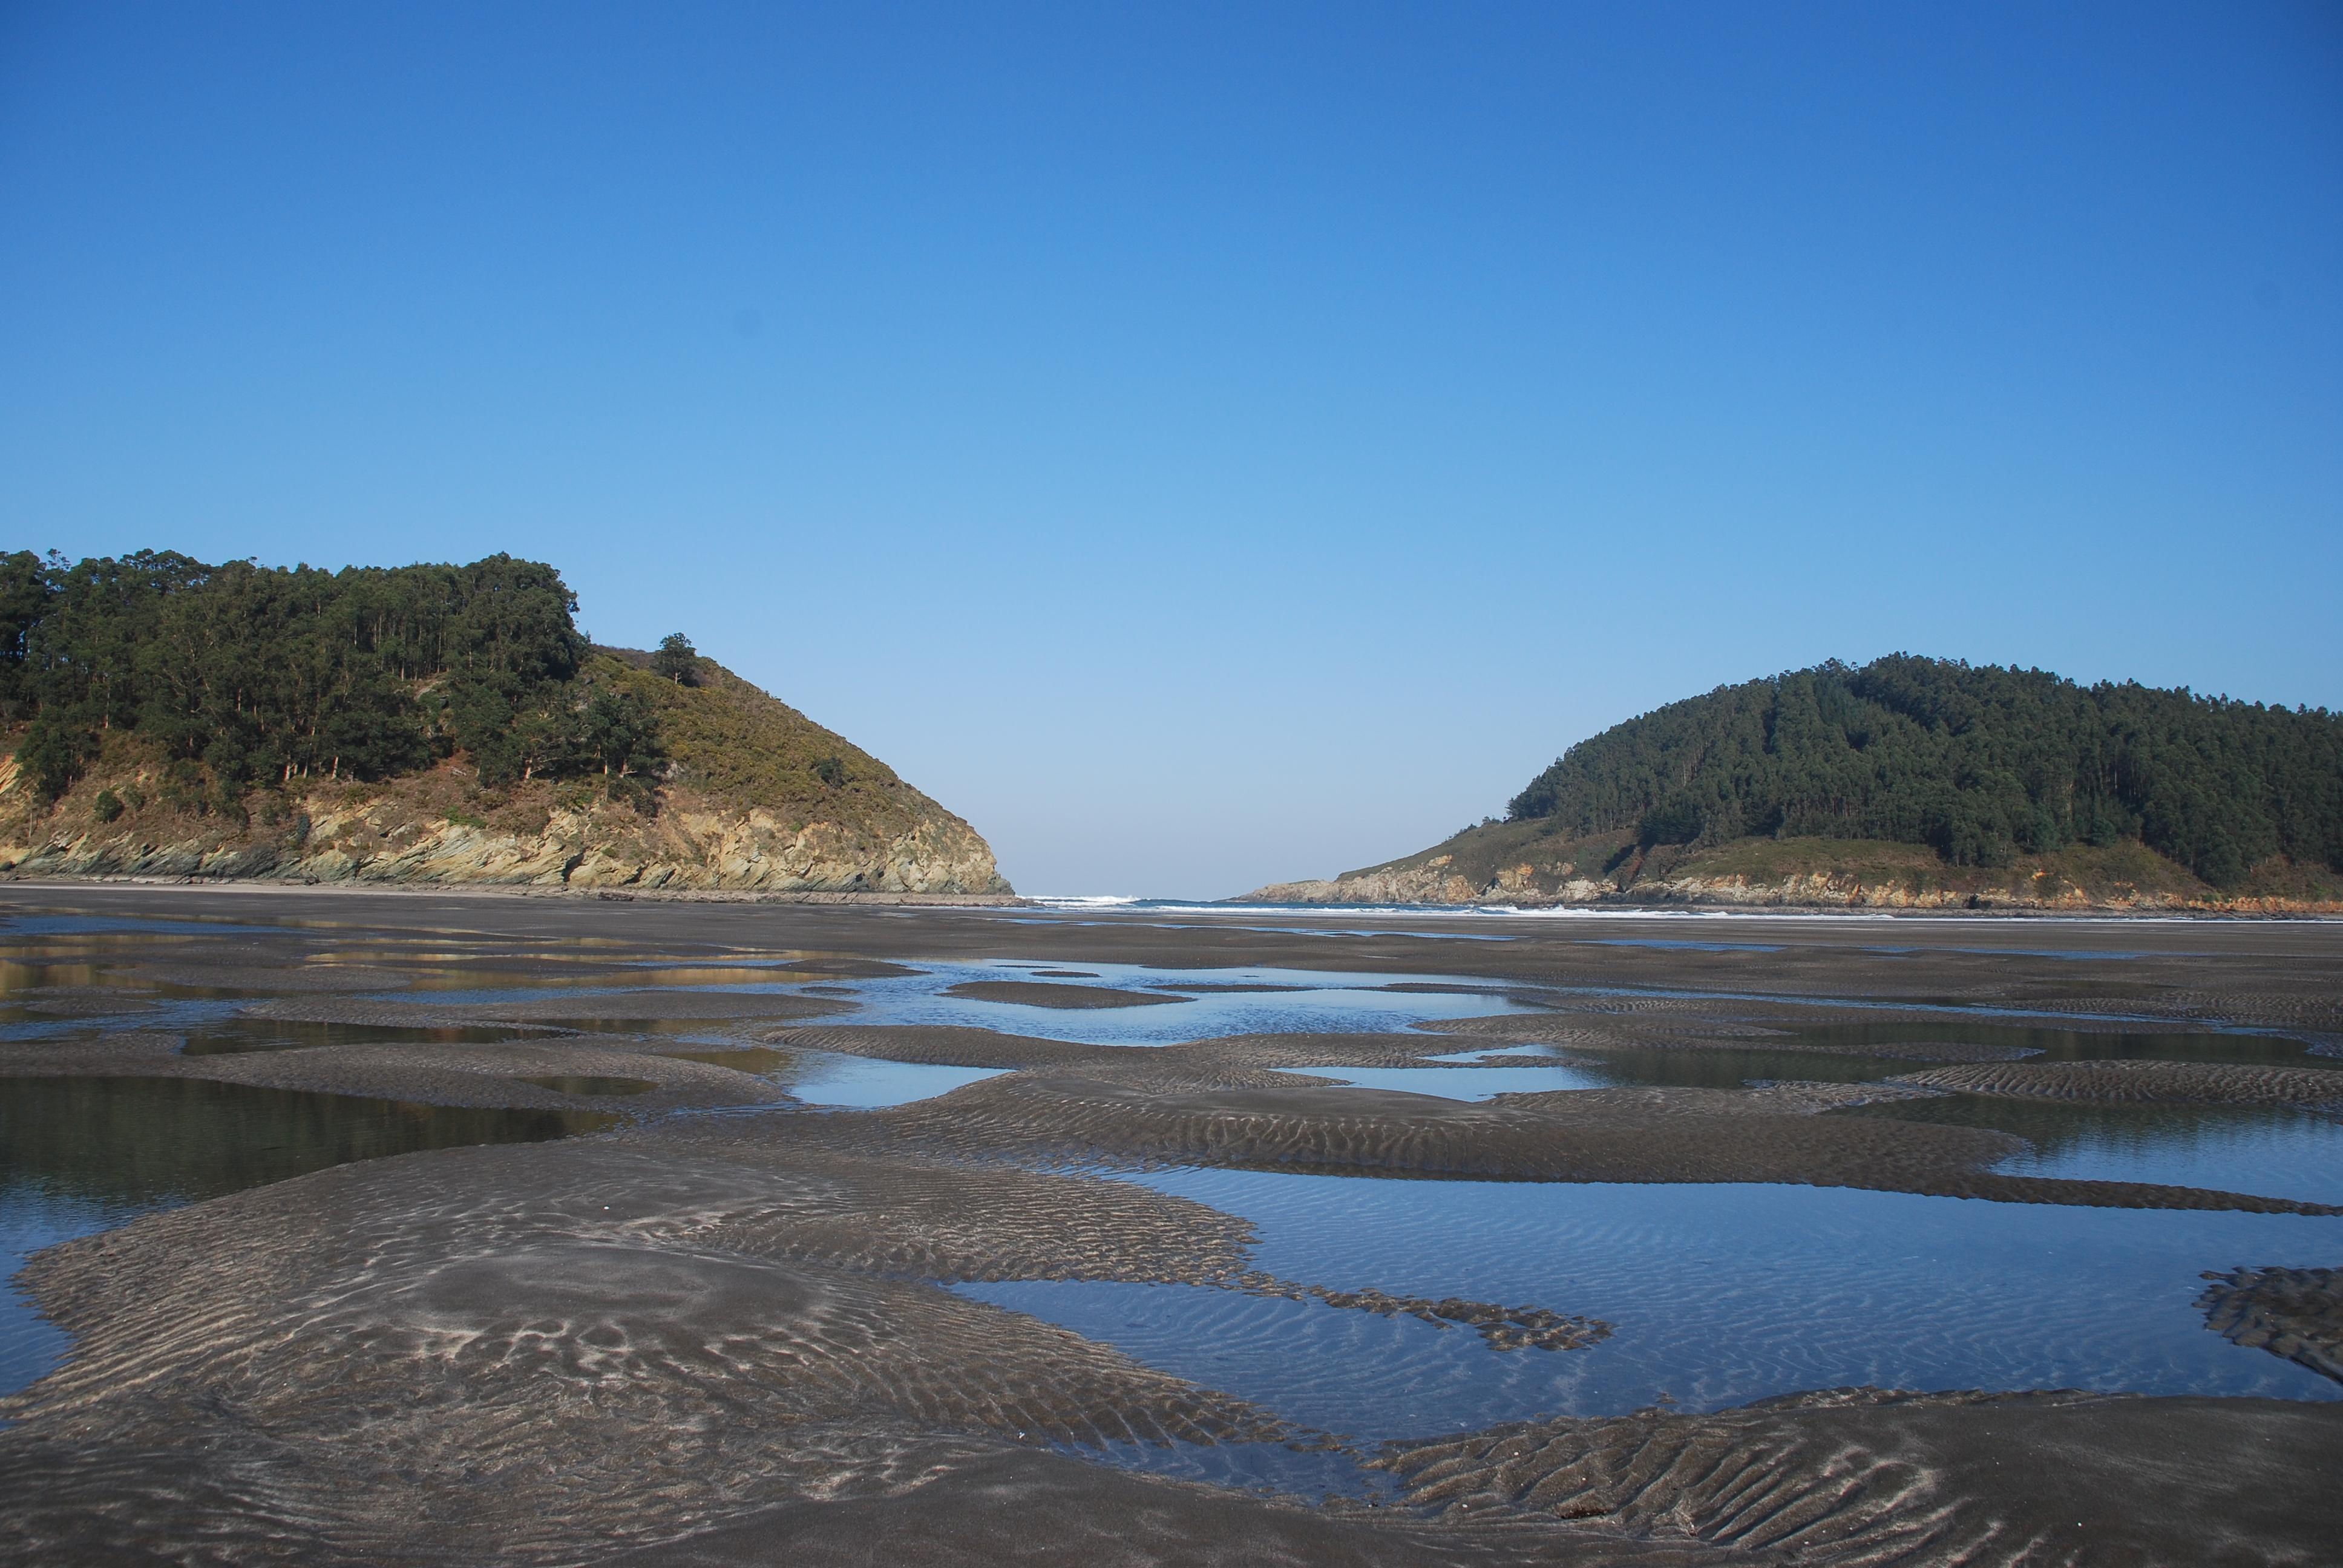 Playa Calas de Ladrido / Vidueiros